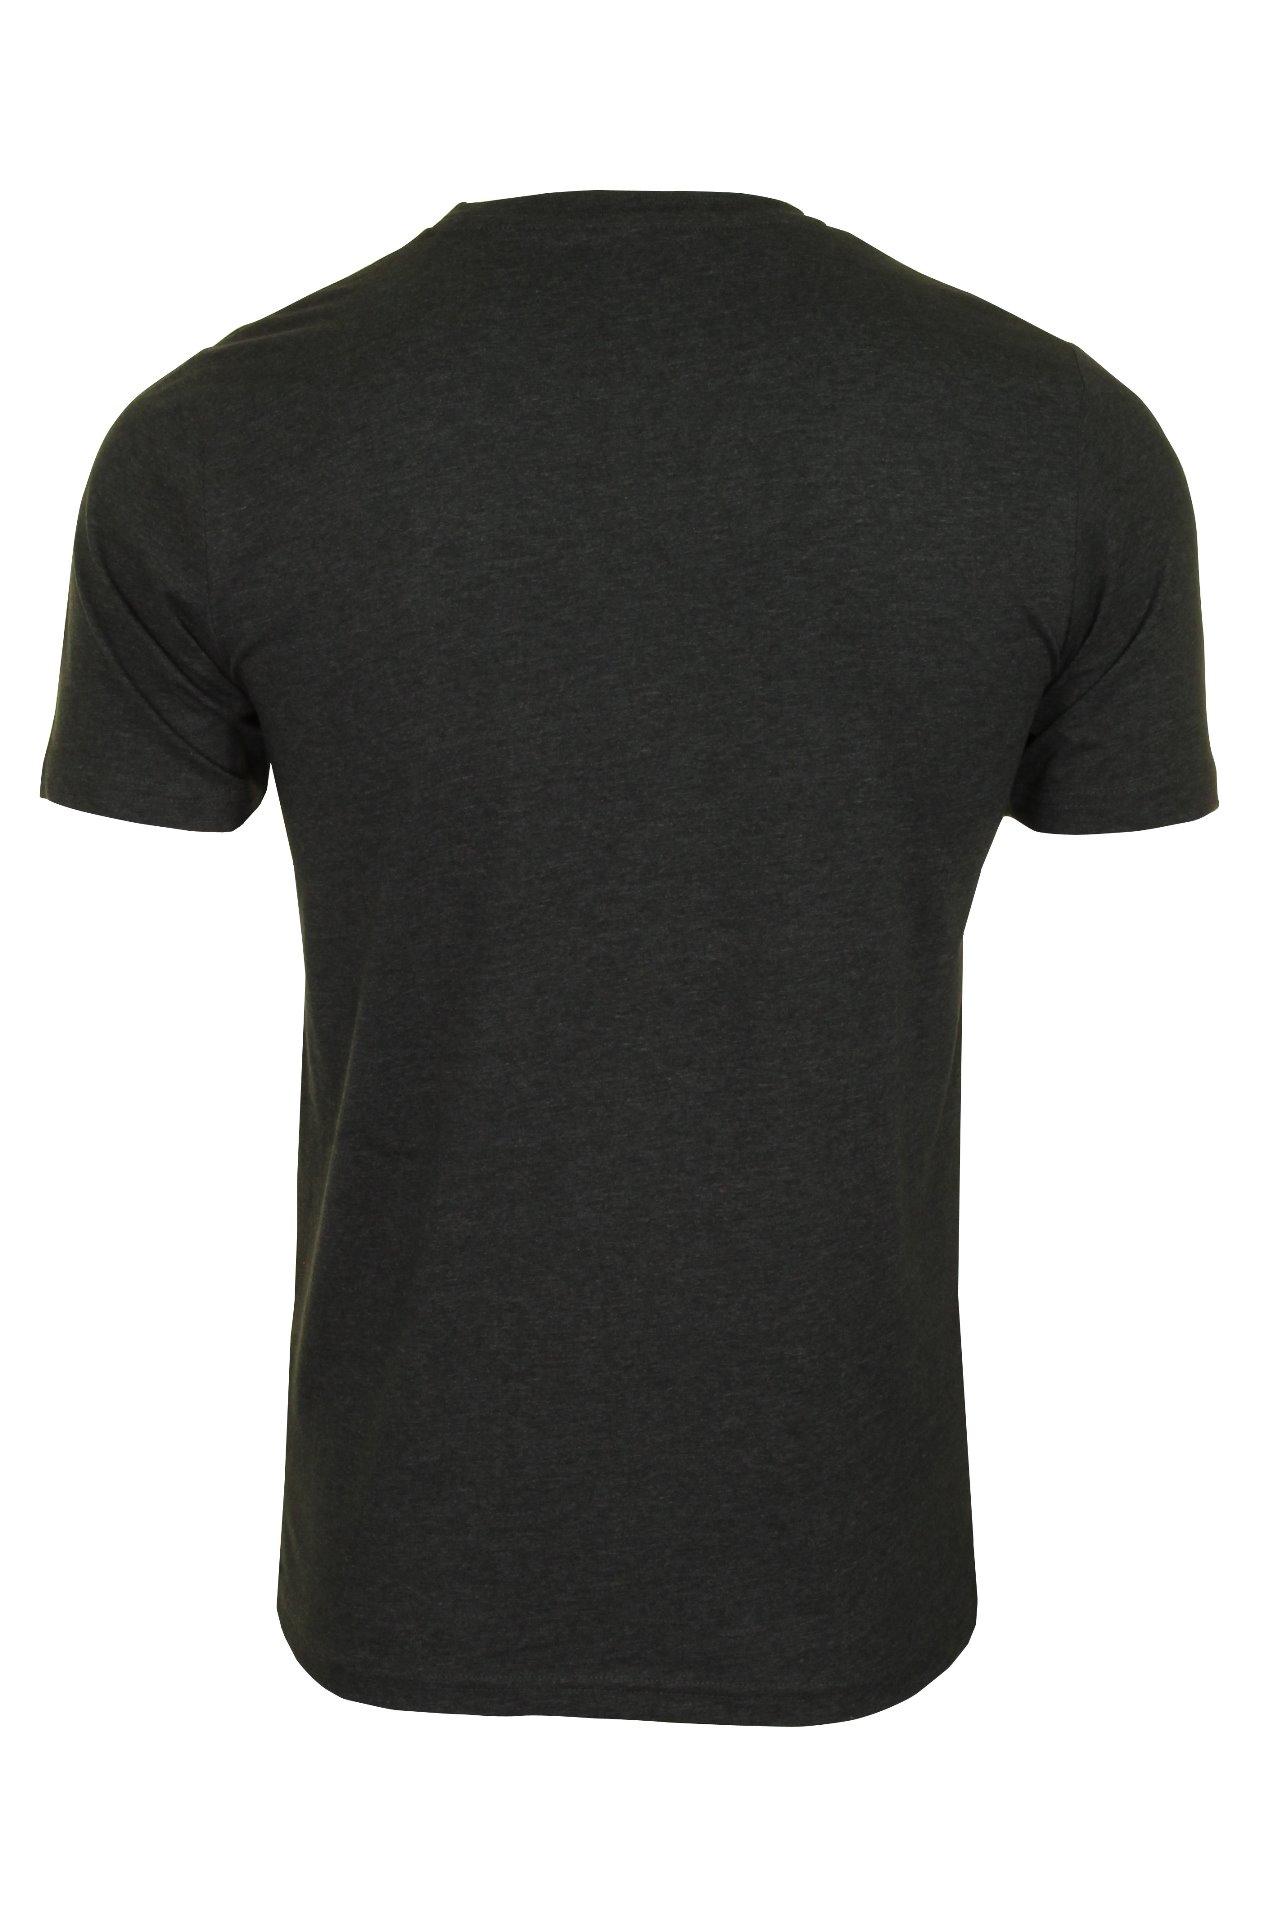 Tokyo-Laundry-Mens-Jersey-Crew-Neck-T-Shirt-039-San-Service-039 thumbnail 4